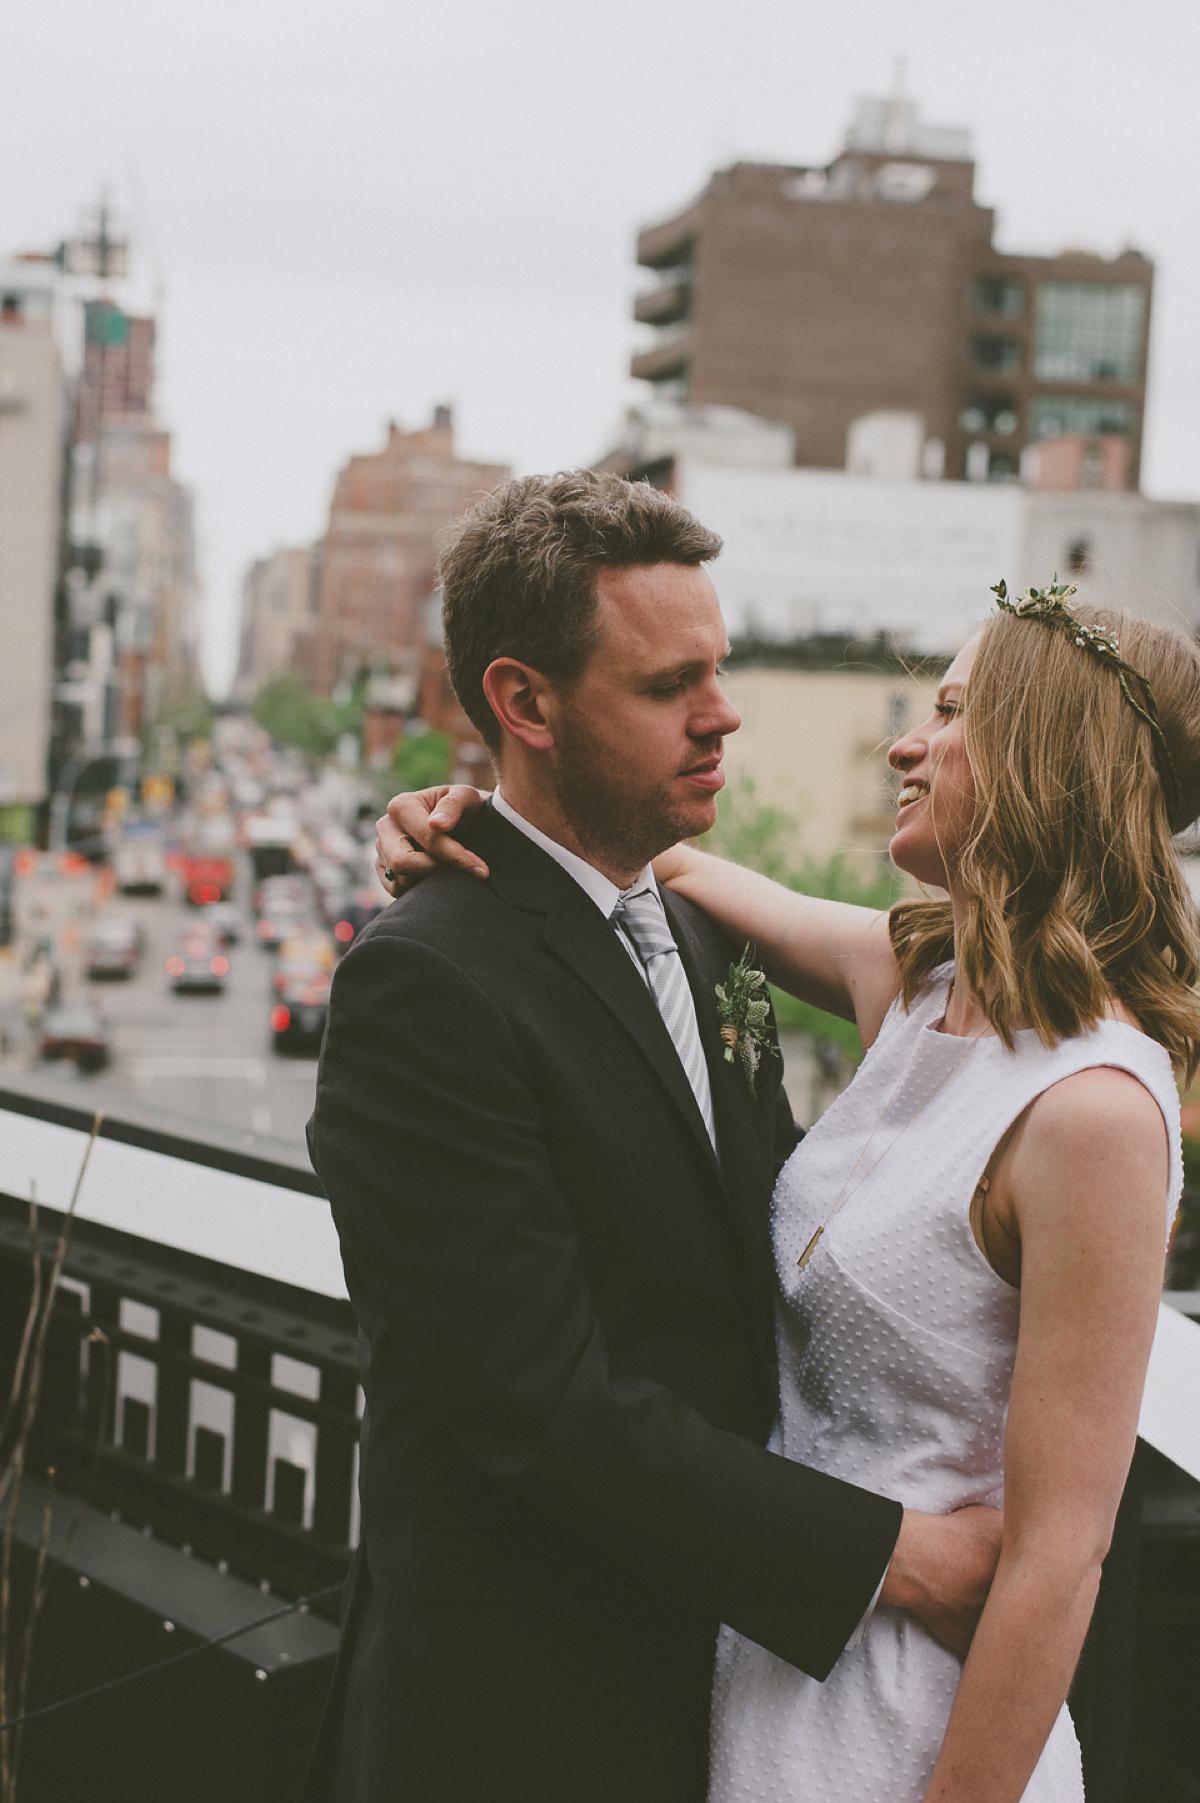 Short wedding dresses in new york city bridesmaid dresses for City hall wedding dresses nyc